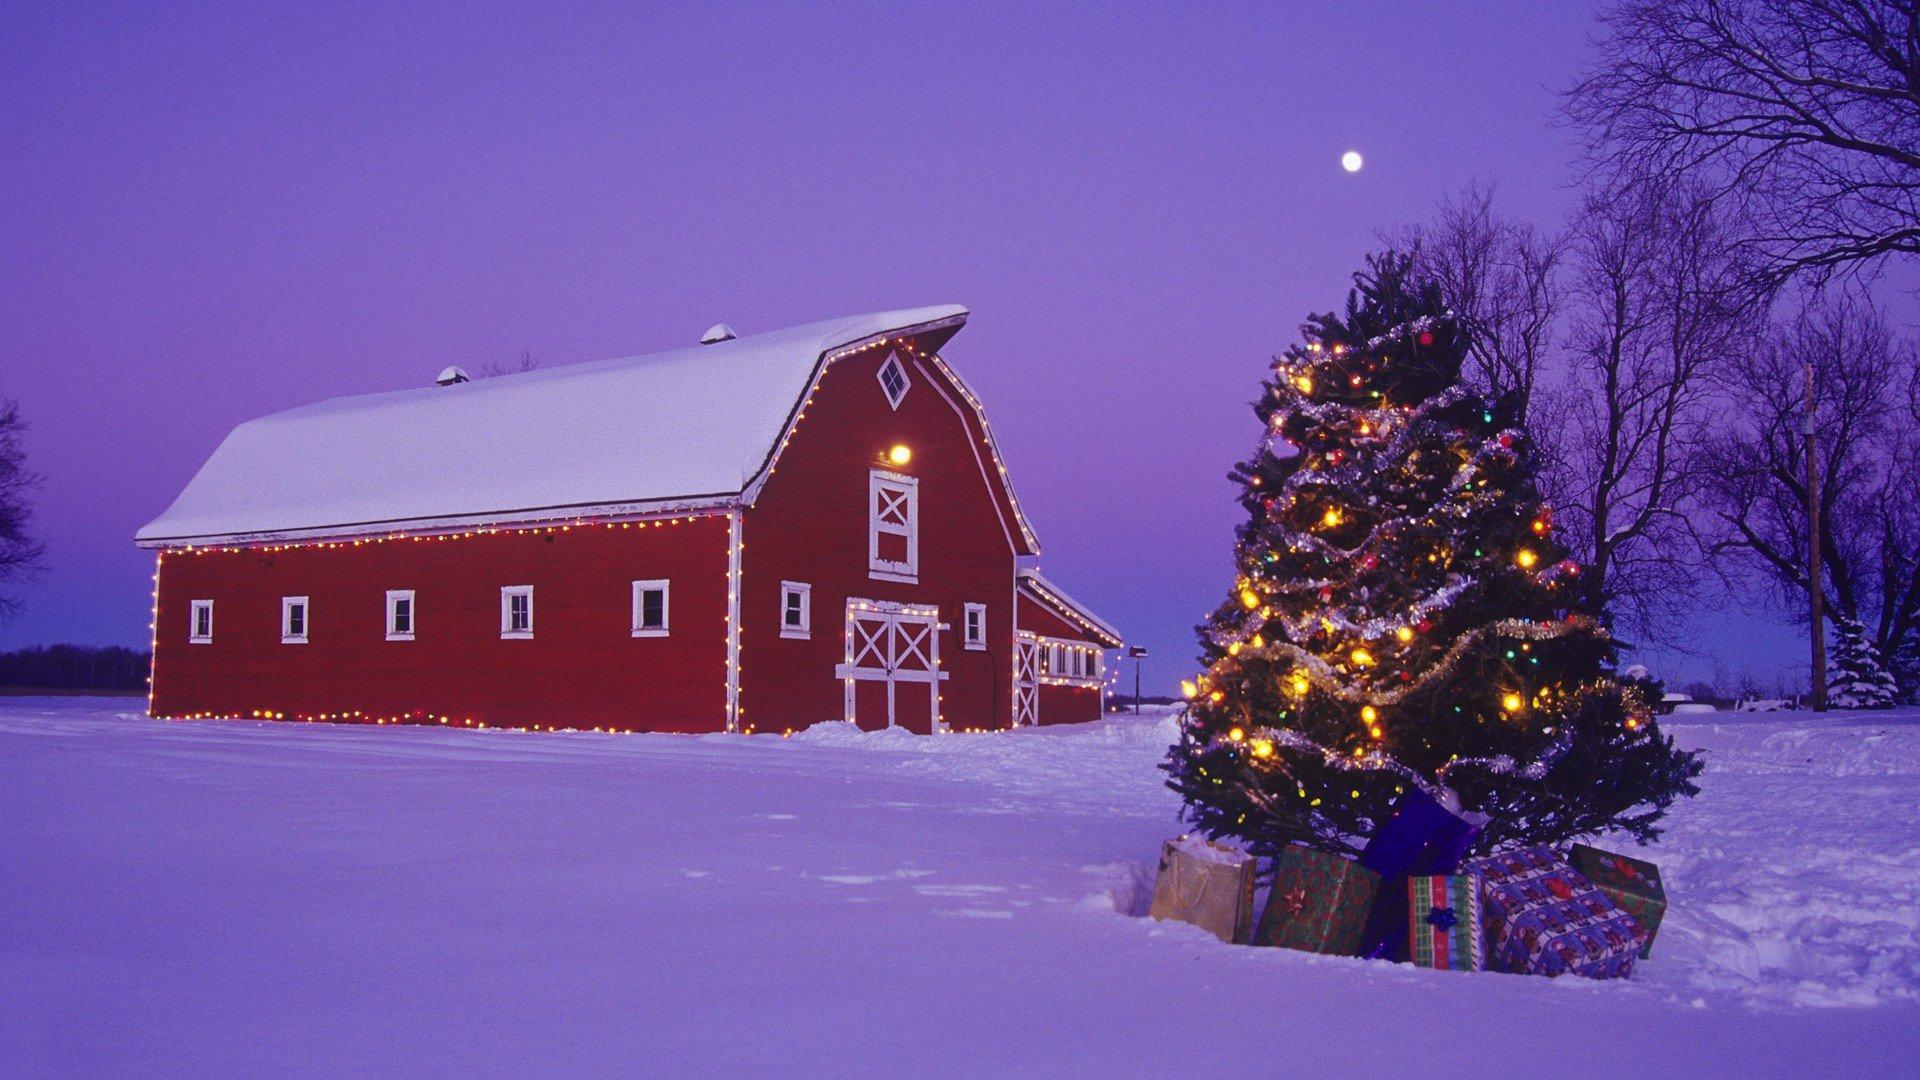 Wallpaper : 1920x1080 px, barn, Canada ...